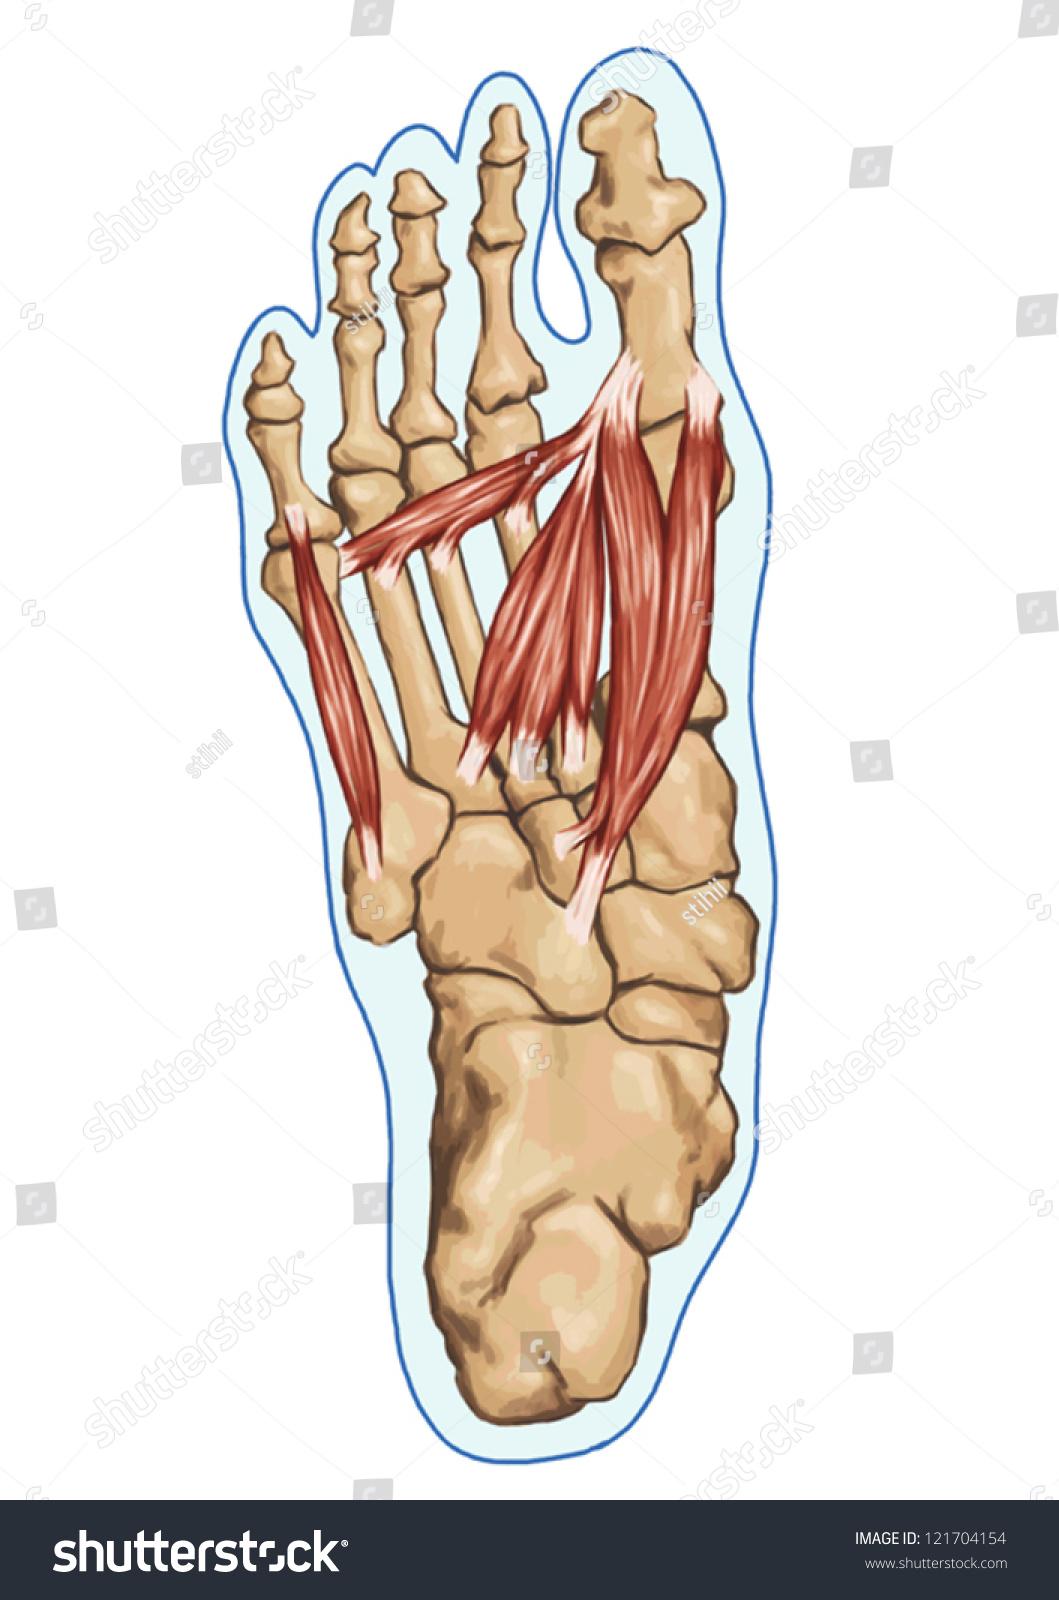 Anatomy Leg Foot Human Muscular Bones Stock Vector 121704154 ...